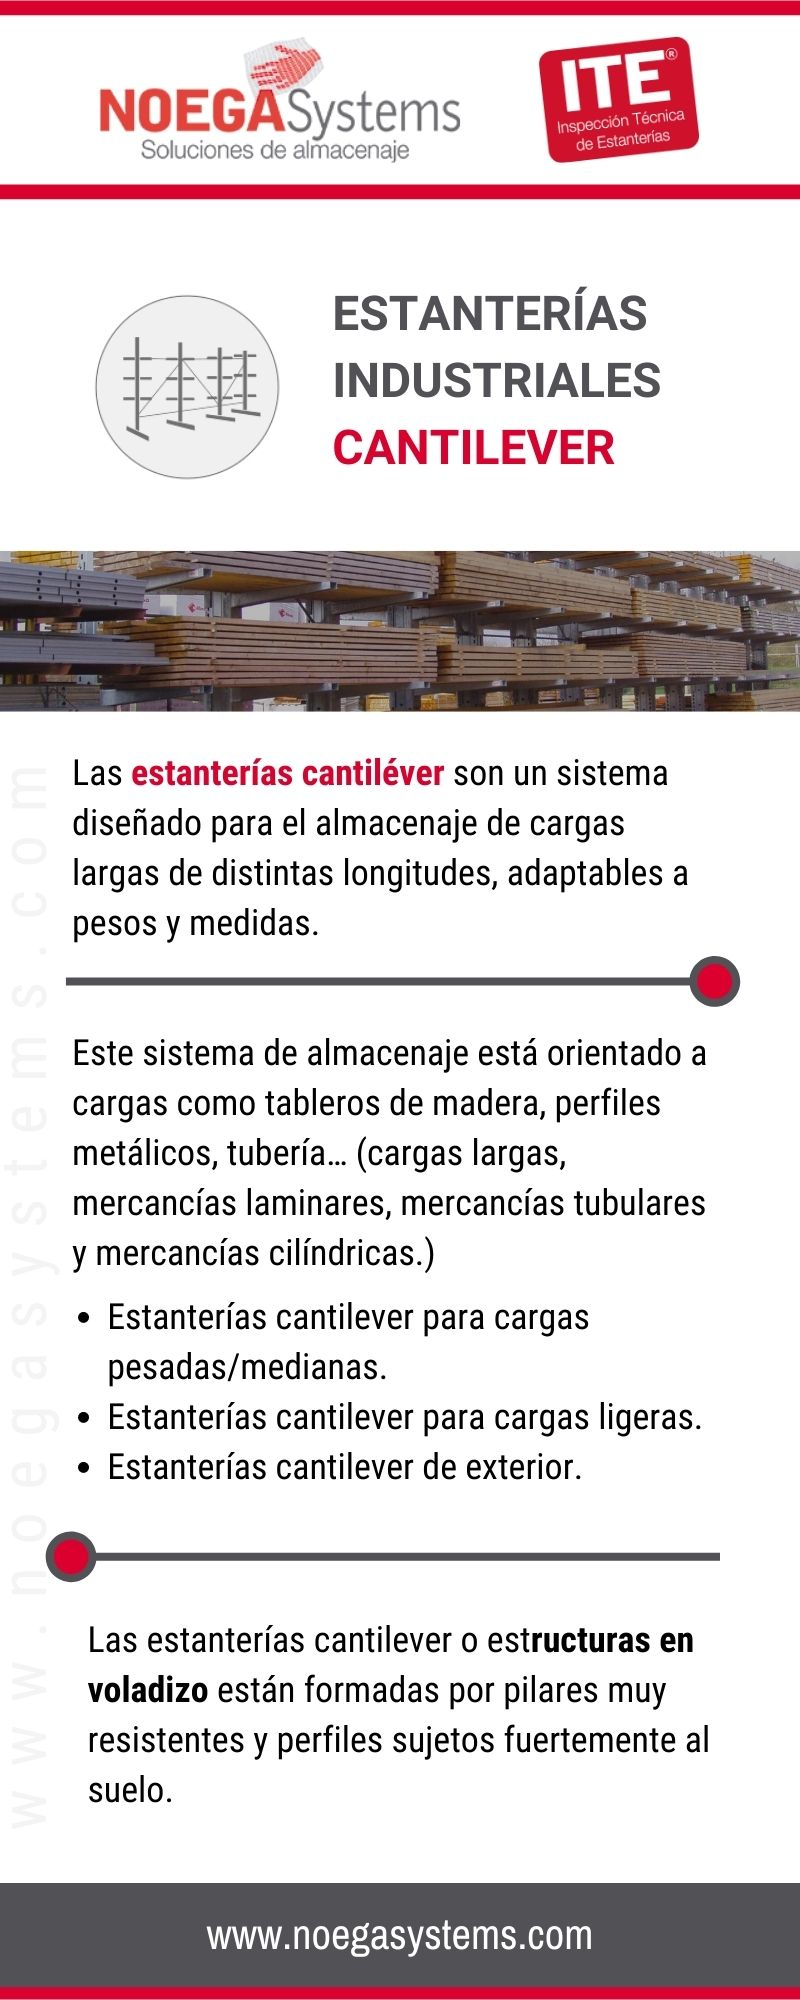 Infografía Estanterías Industriales Cantilever